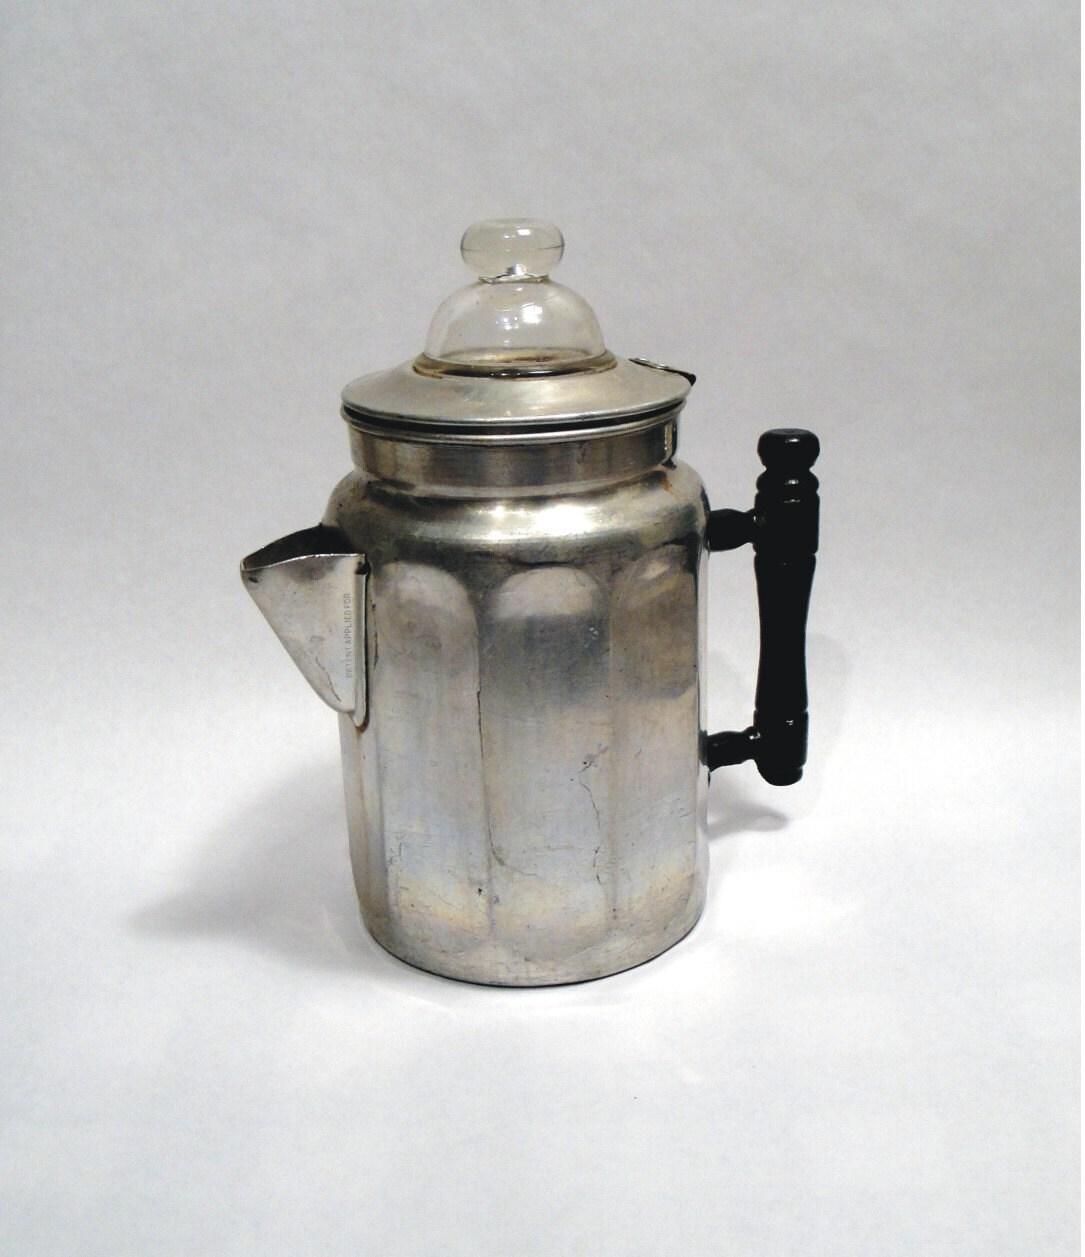 1912 Antique VTG Stove Top Coffee Pot Maker by Lifeinmommatone